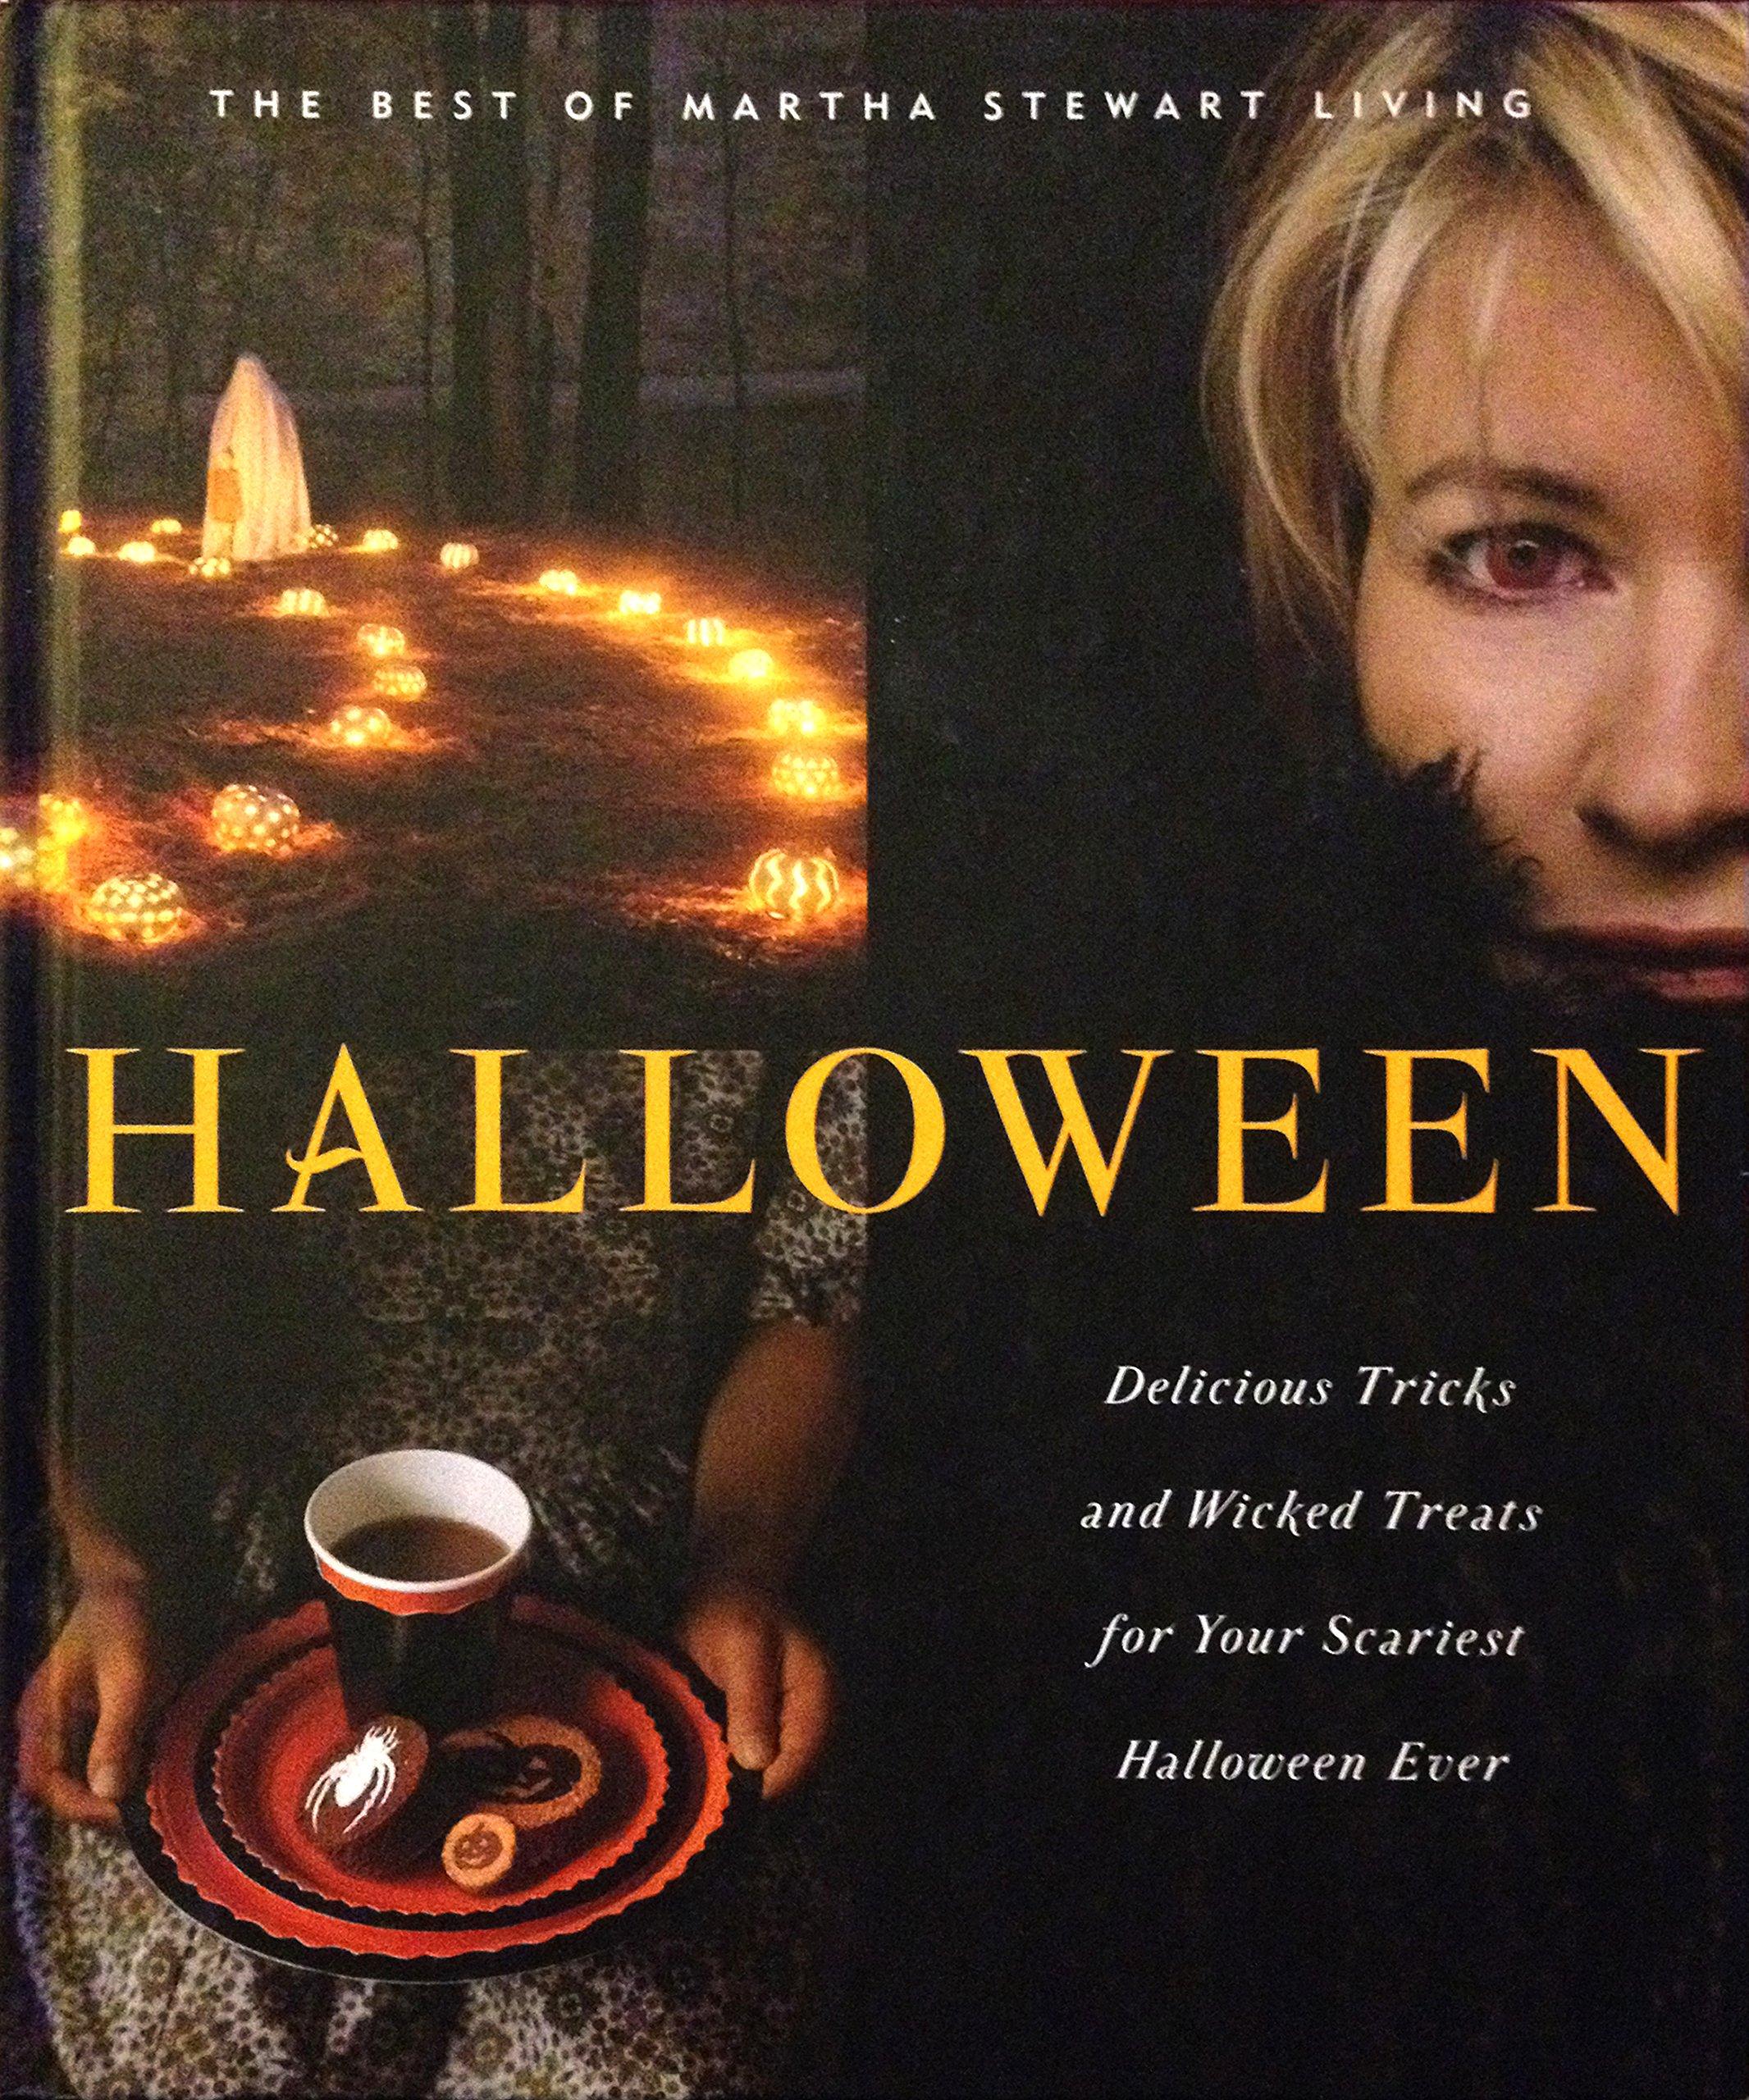 Halloween: The Best of Martha Stewart Living